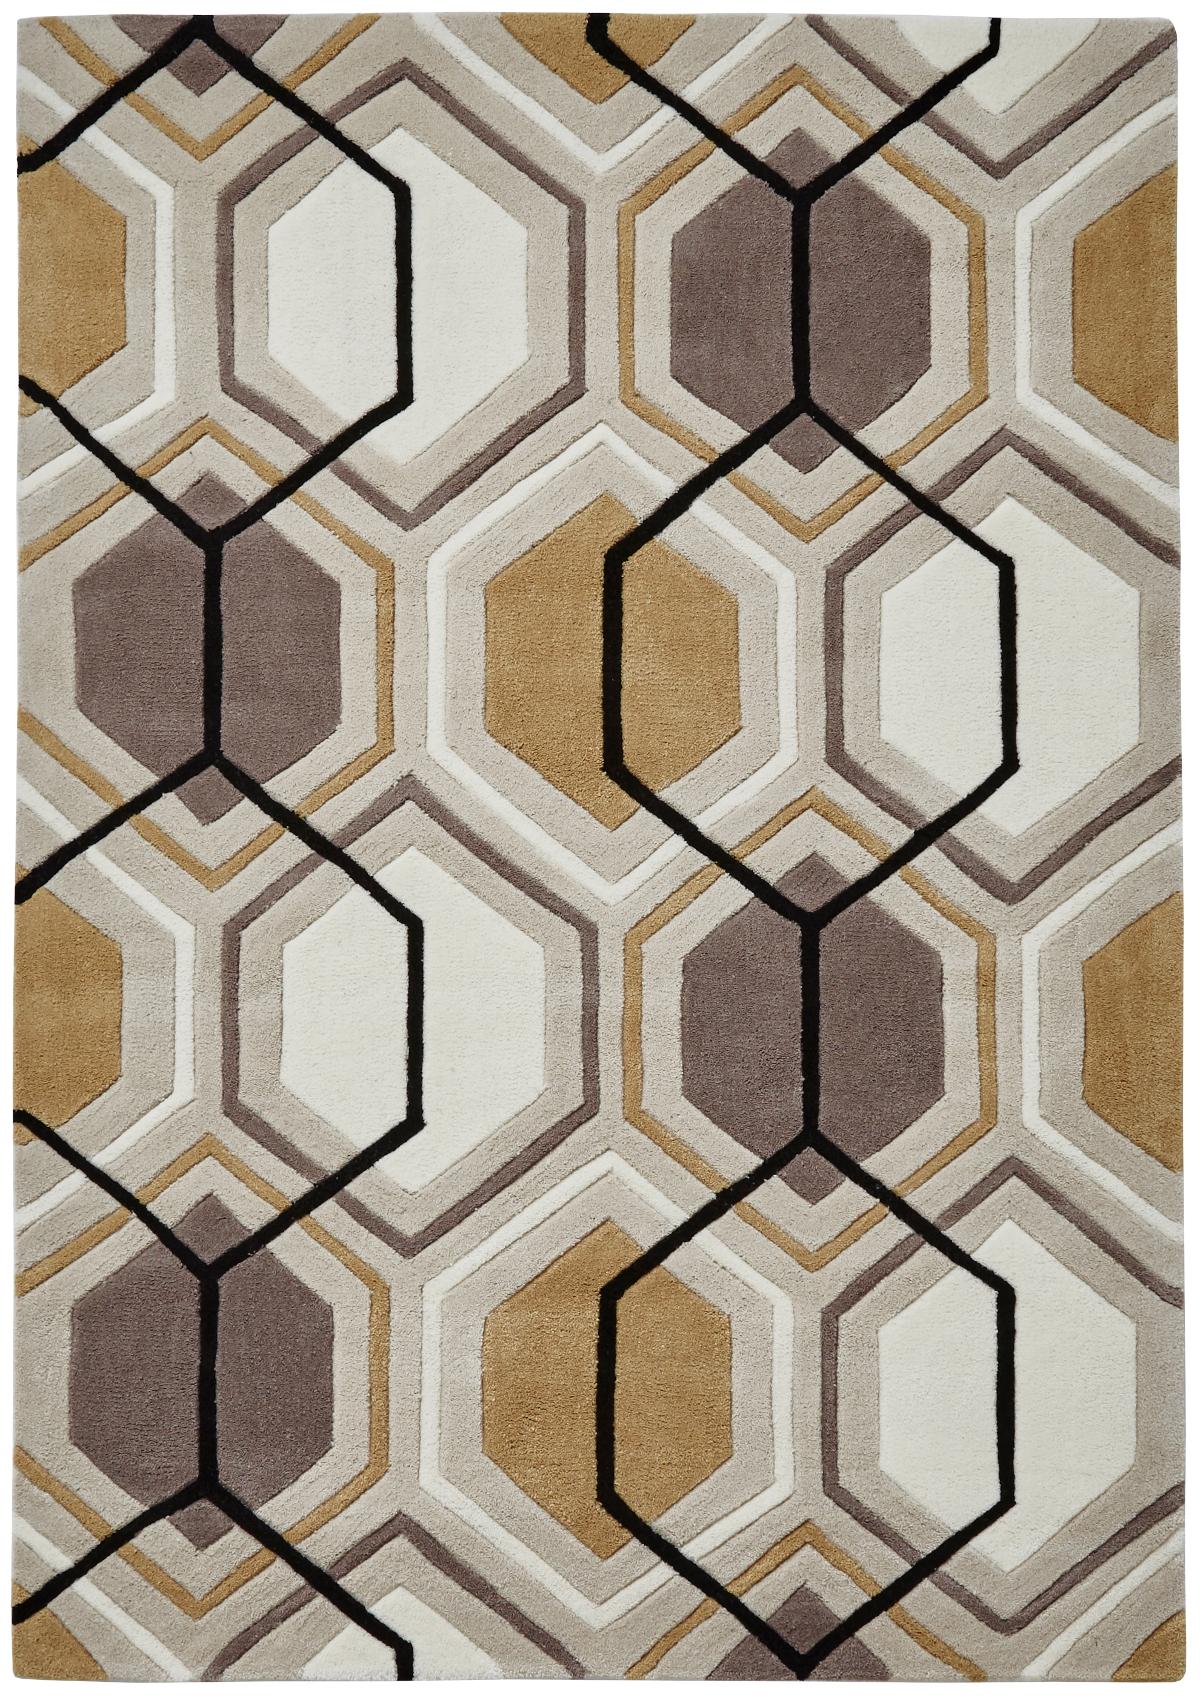 Modern Geometric Design Rug Hexagon 100 Acrylic Hand